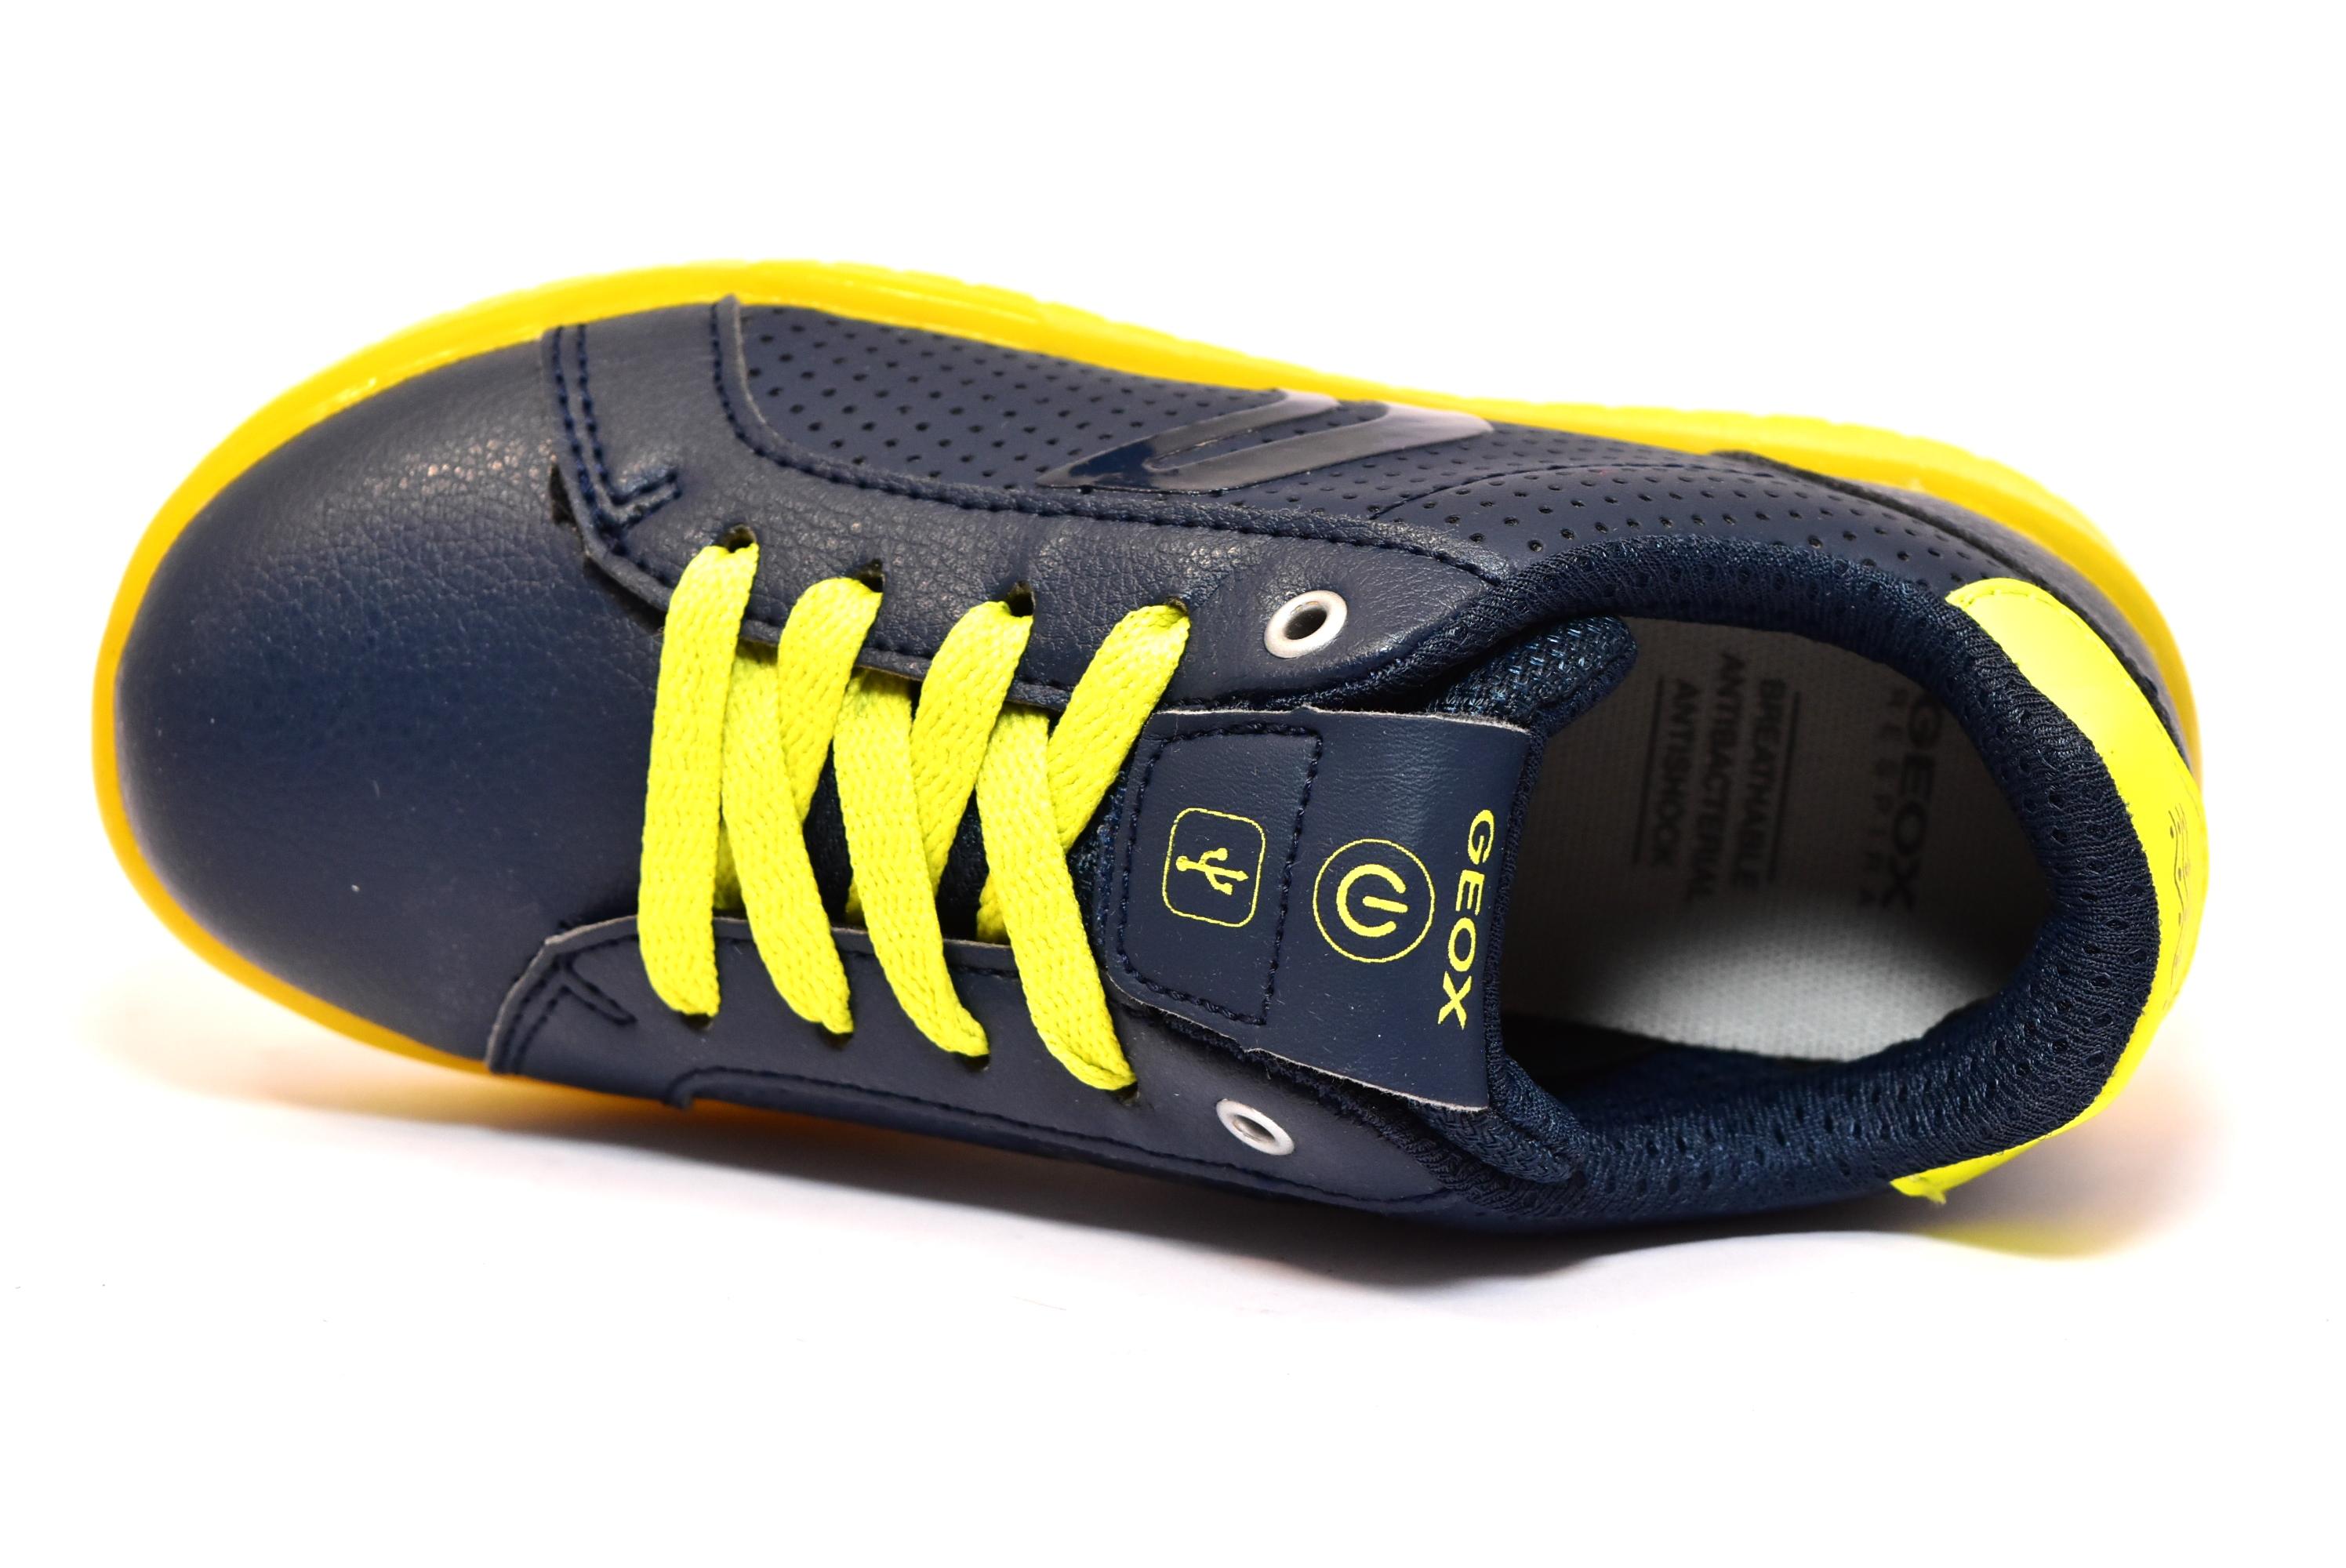 aff6f509f5 Geox Scarpe Bambino Luci C0749 Blu 0bcbu J745pb Sneakers rZqWf4rvc